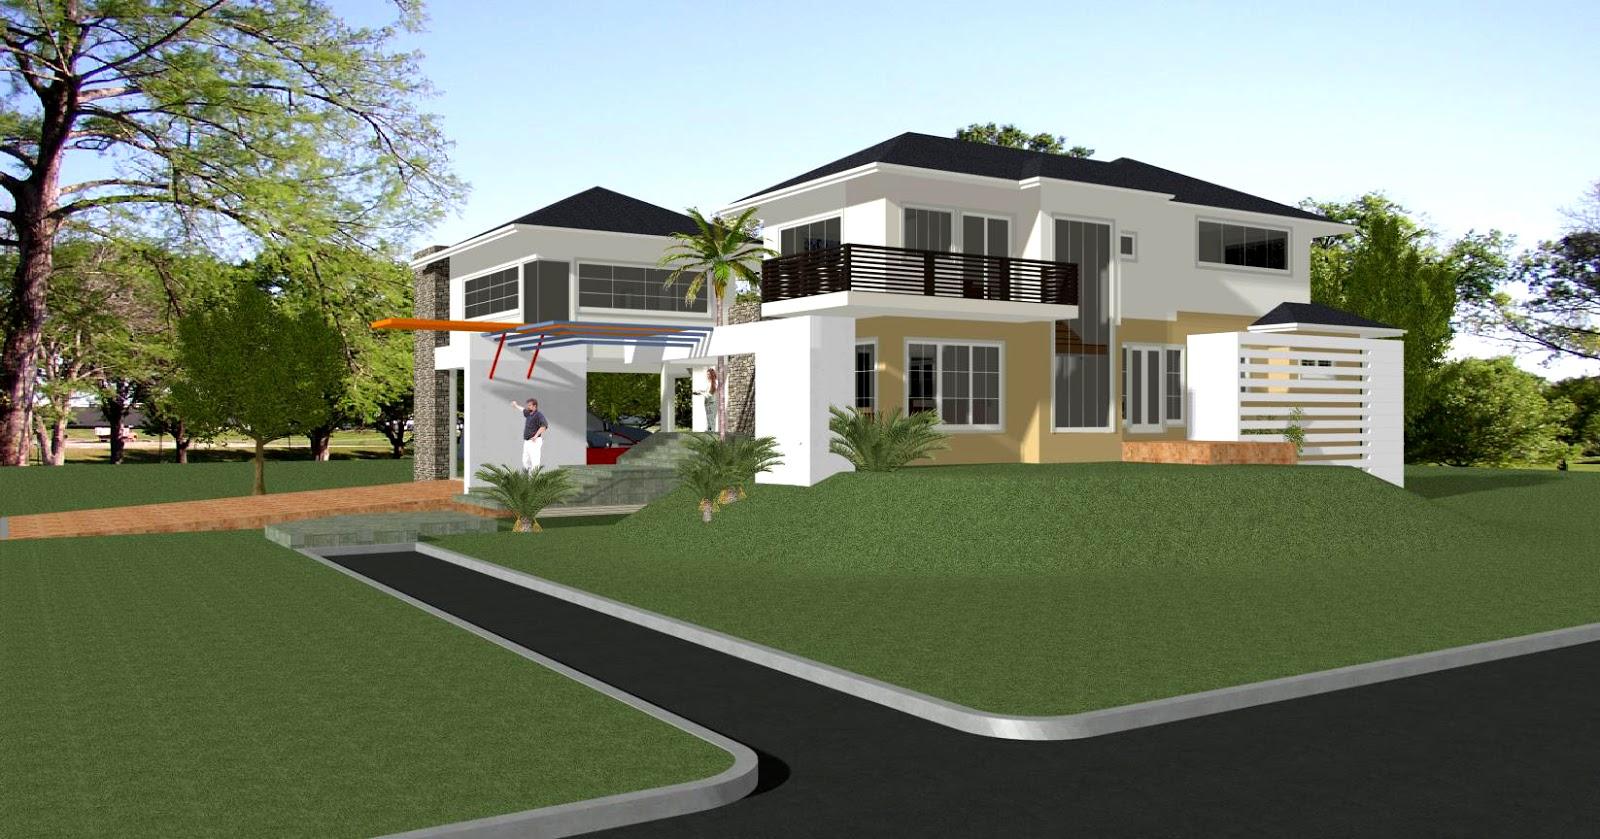 Filipino House Designs Philippinescfedcd Nice House Design Modern